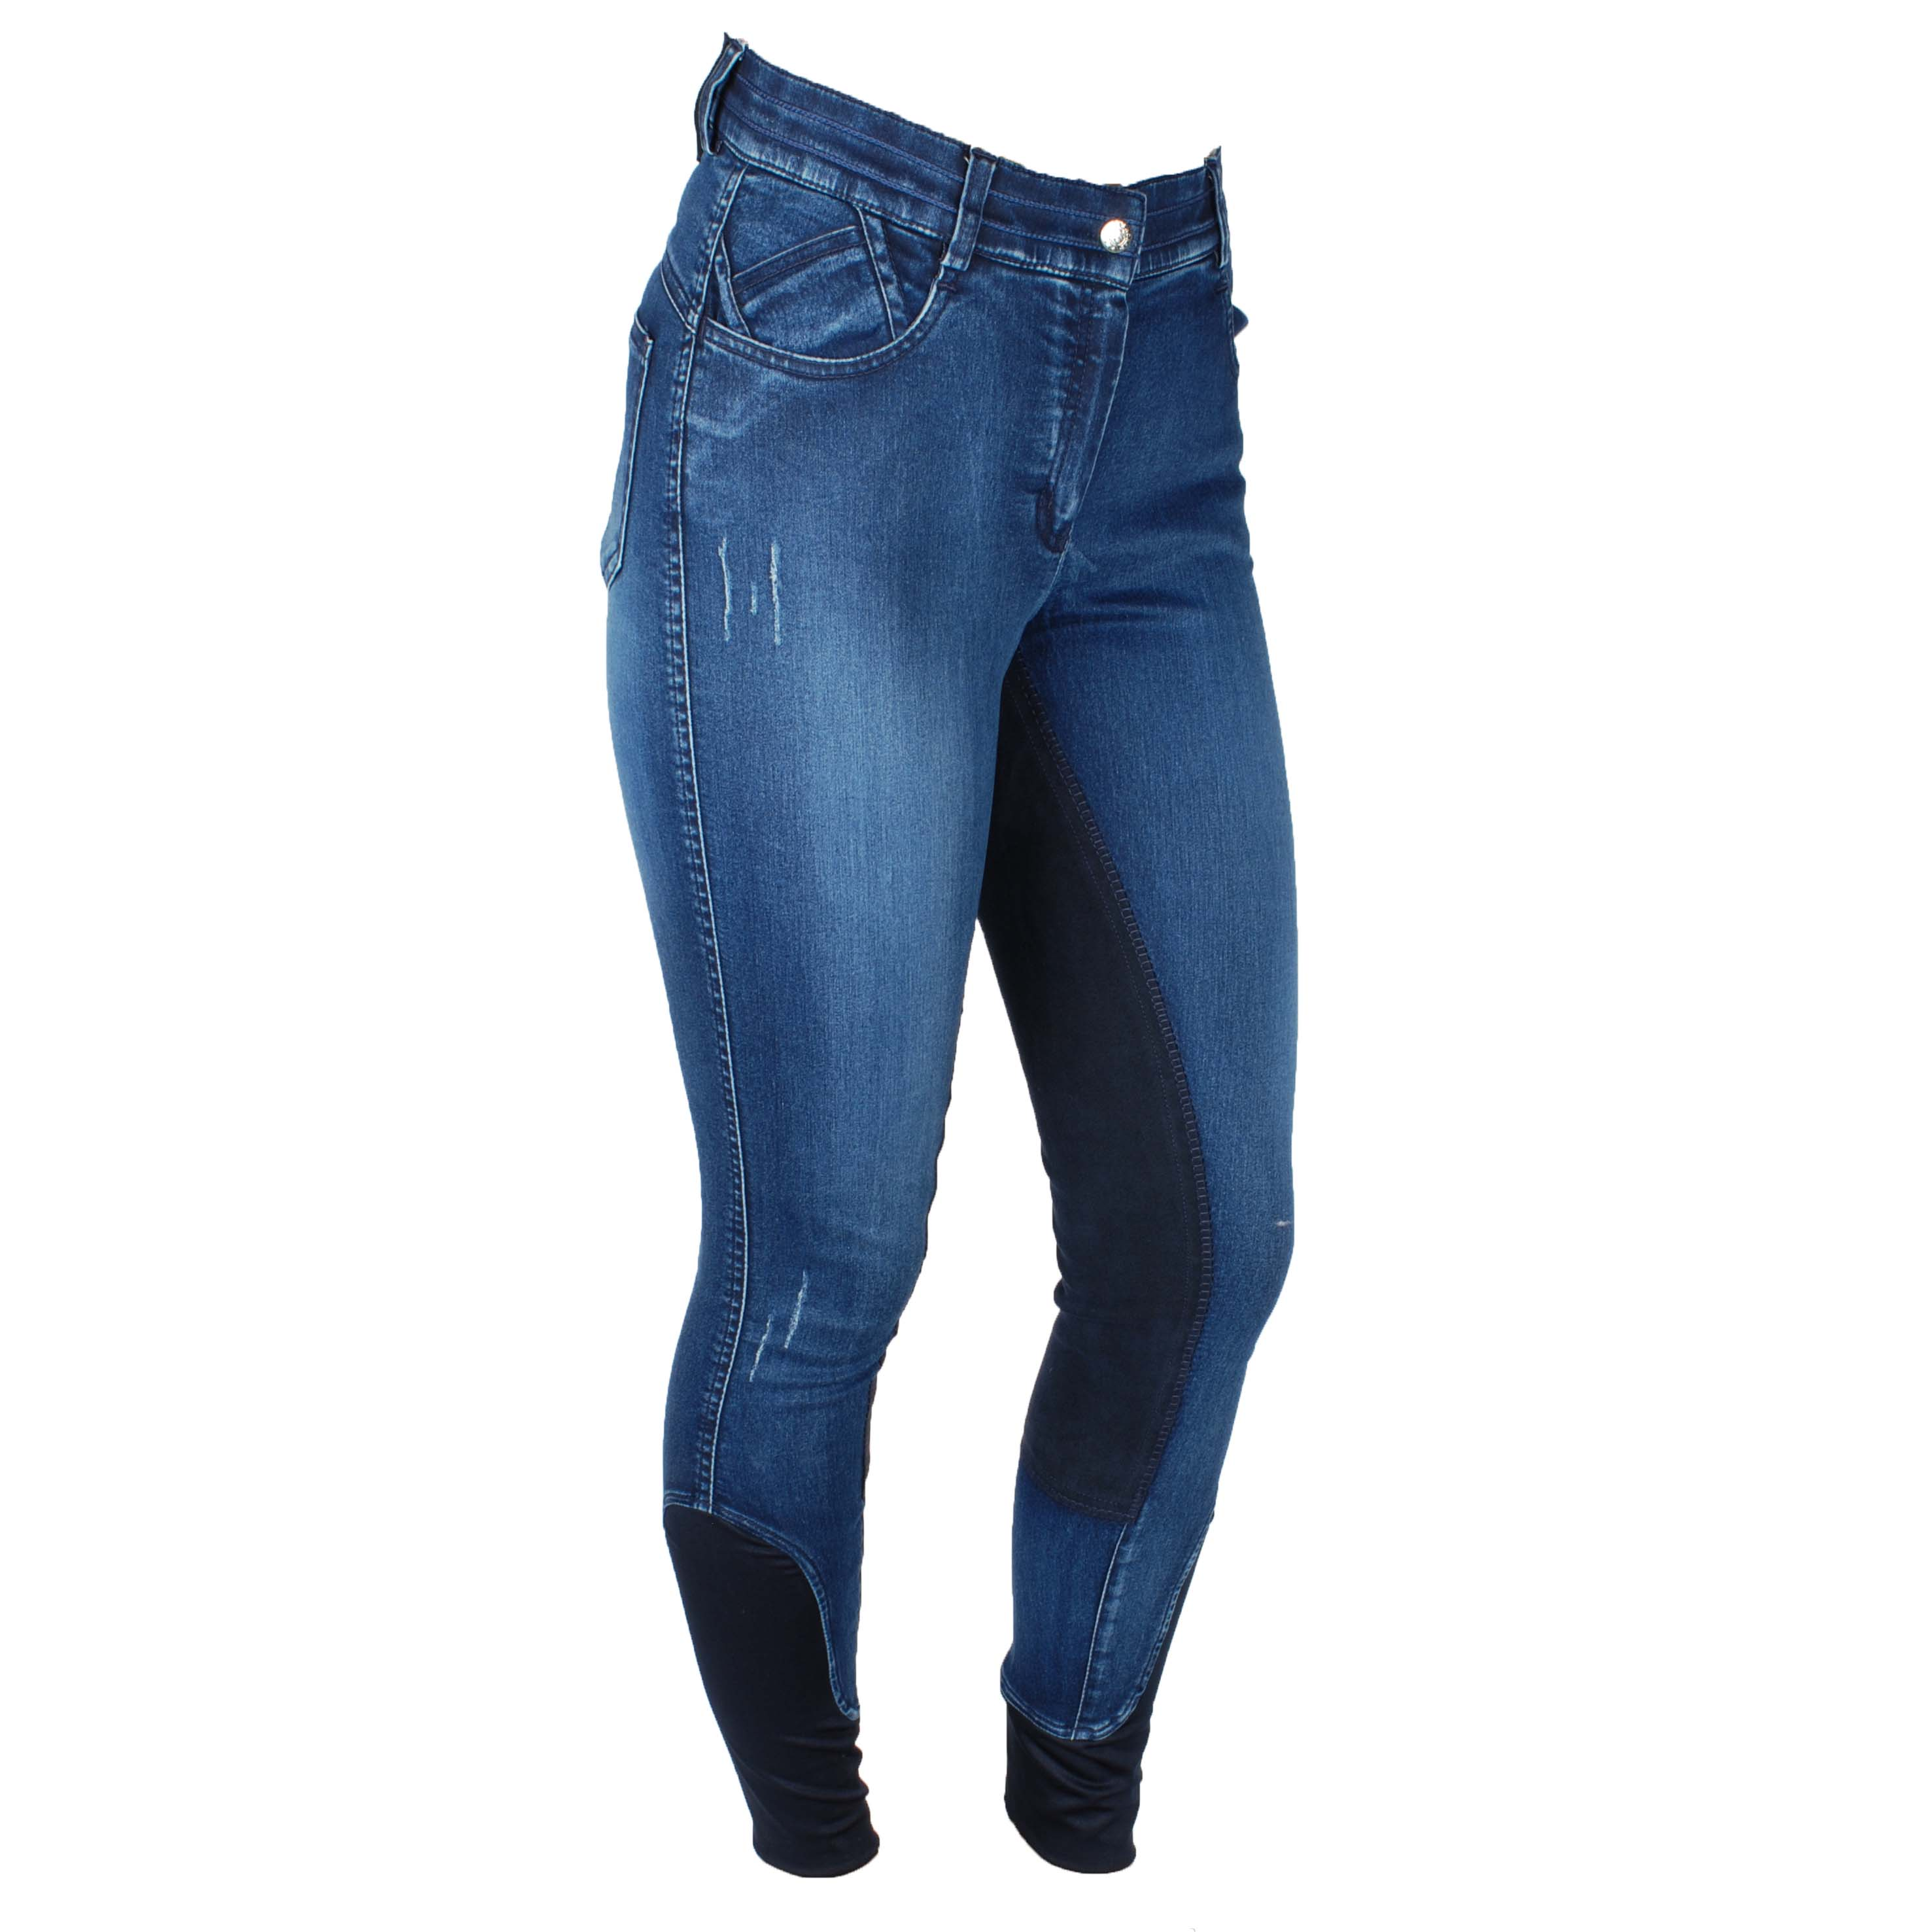 Harrys Horse Burton plus rijbroek jeans maat:42